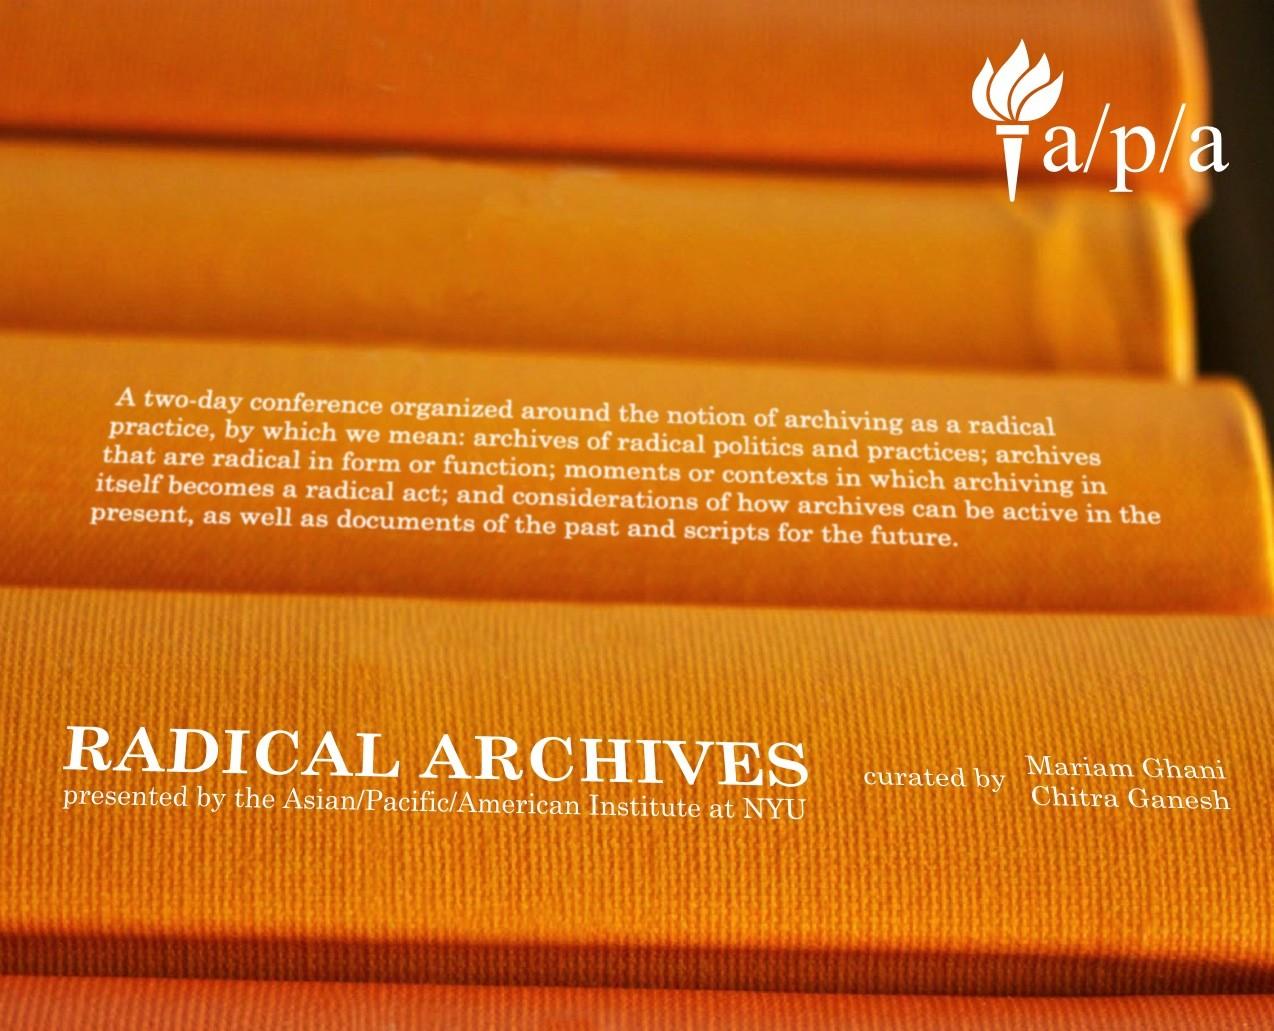 Radical Archives Spring 2014 flyer